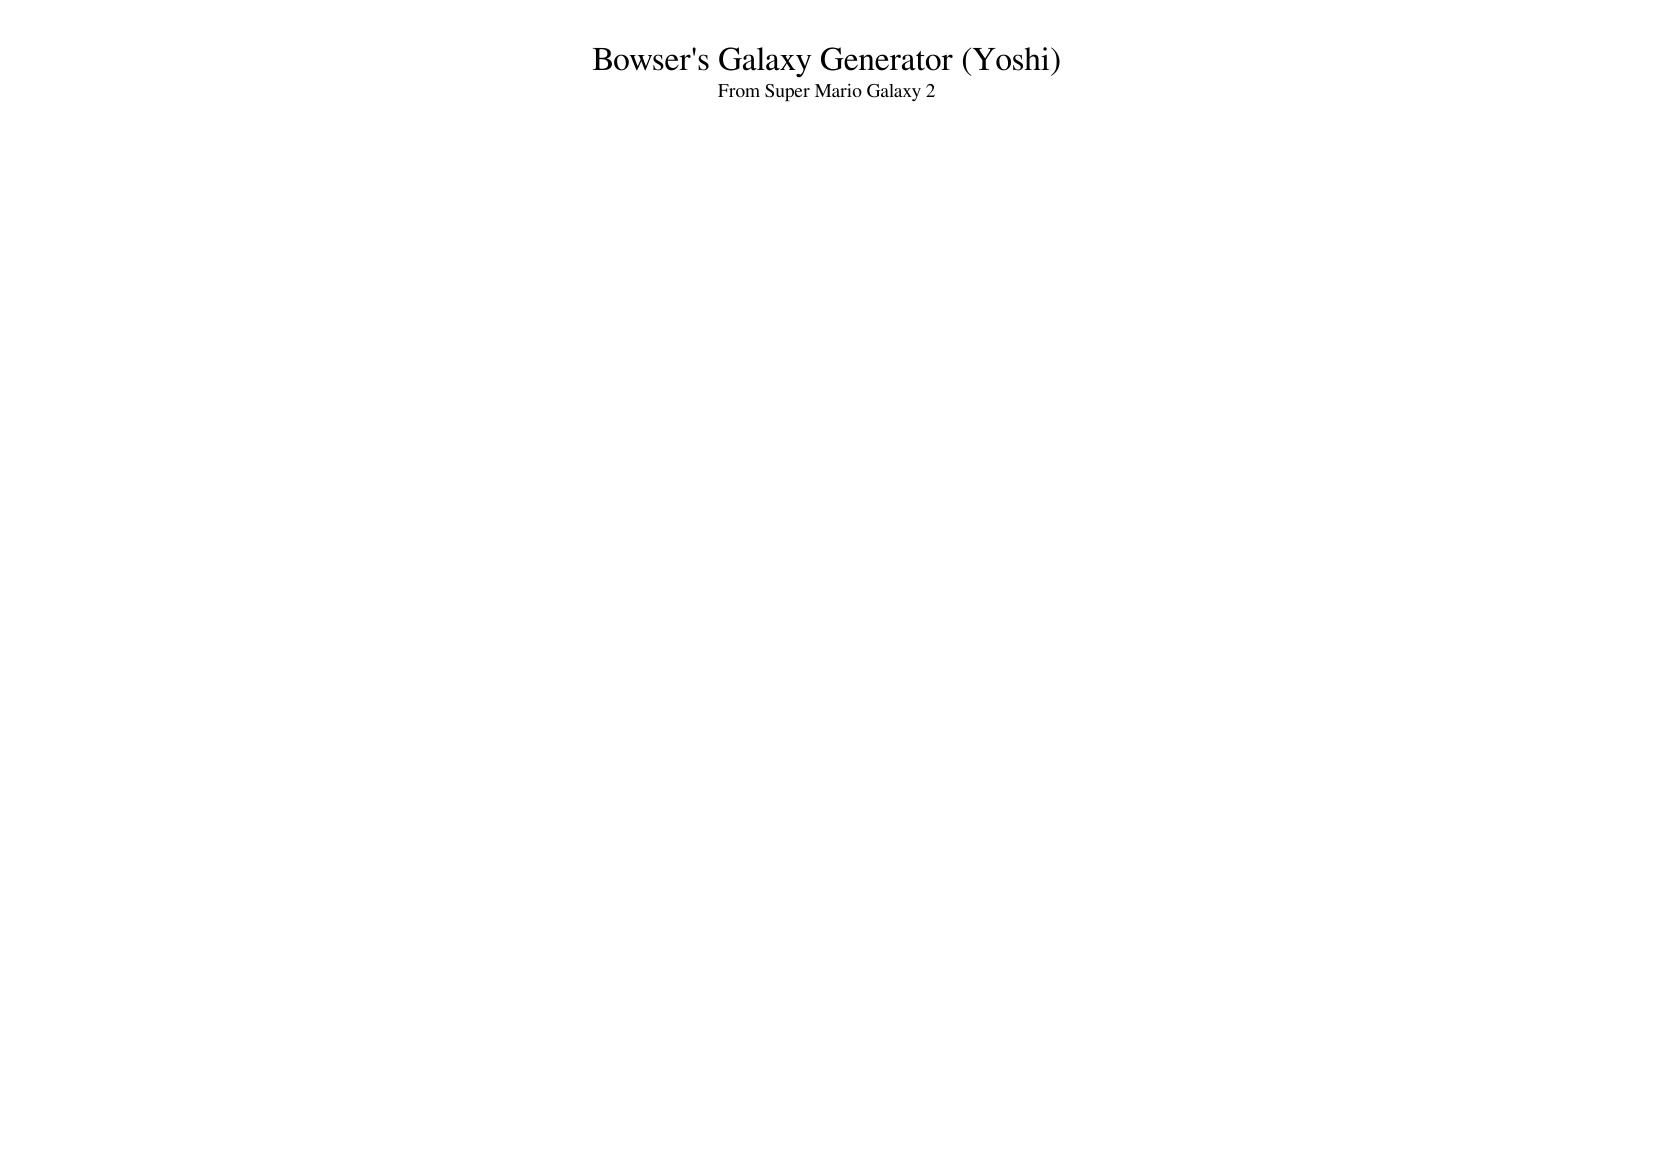 Bowser S Galaxy Generator Yoshi Super Mario Galaxy 2 Sheet Music For Trumpet In B Flat Violin Trombone Flute More Instruments Mixed Ensemble Musescore Com